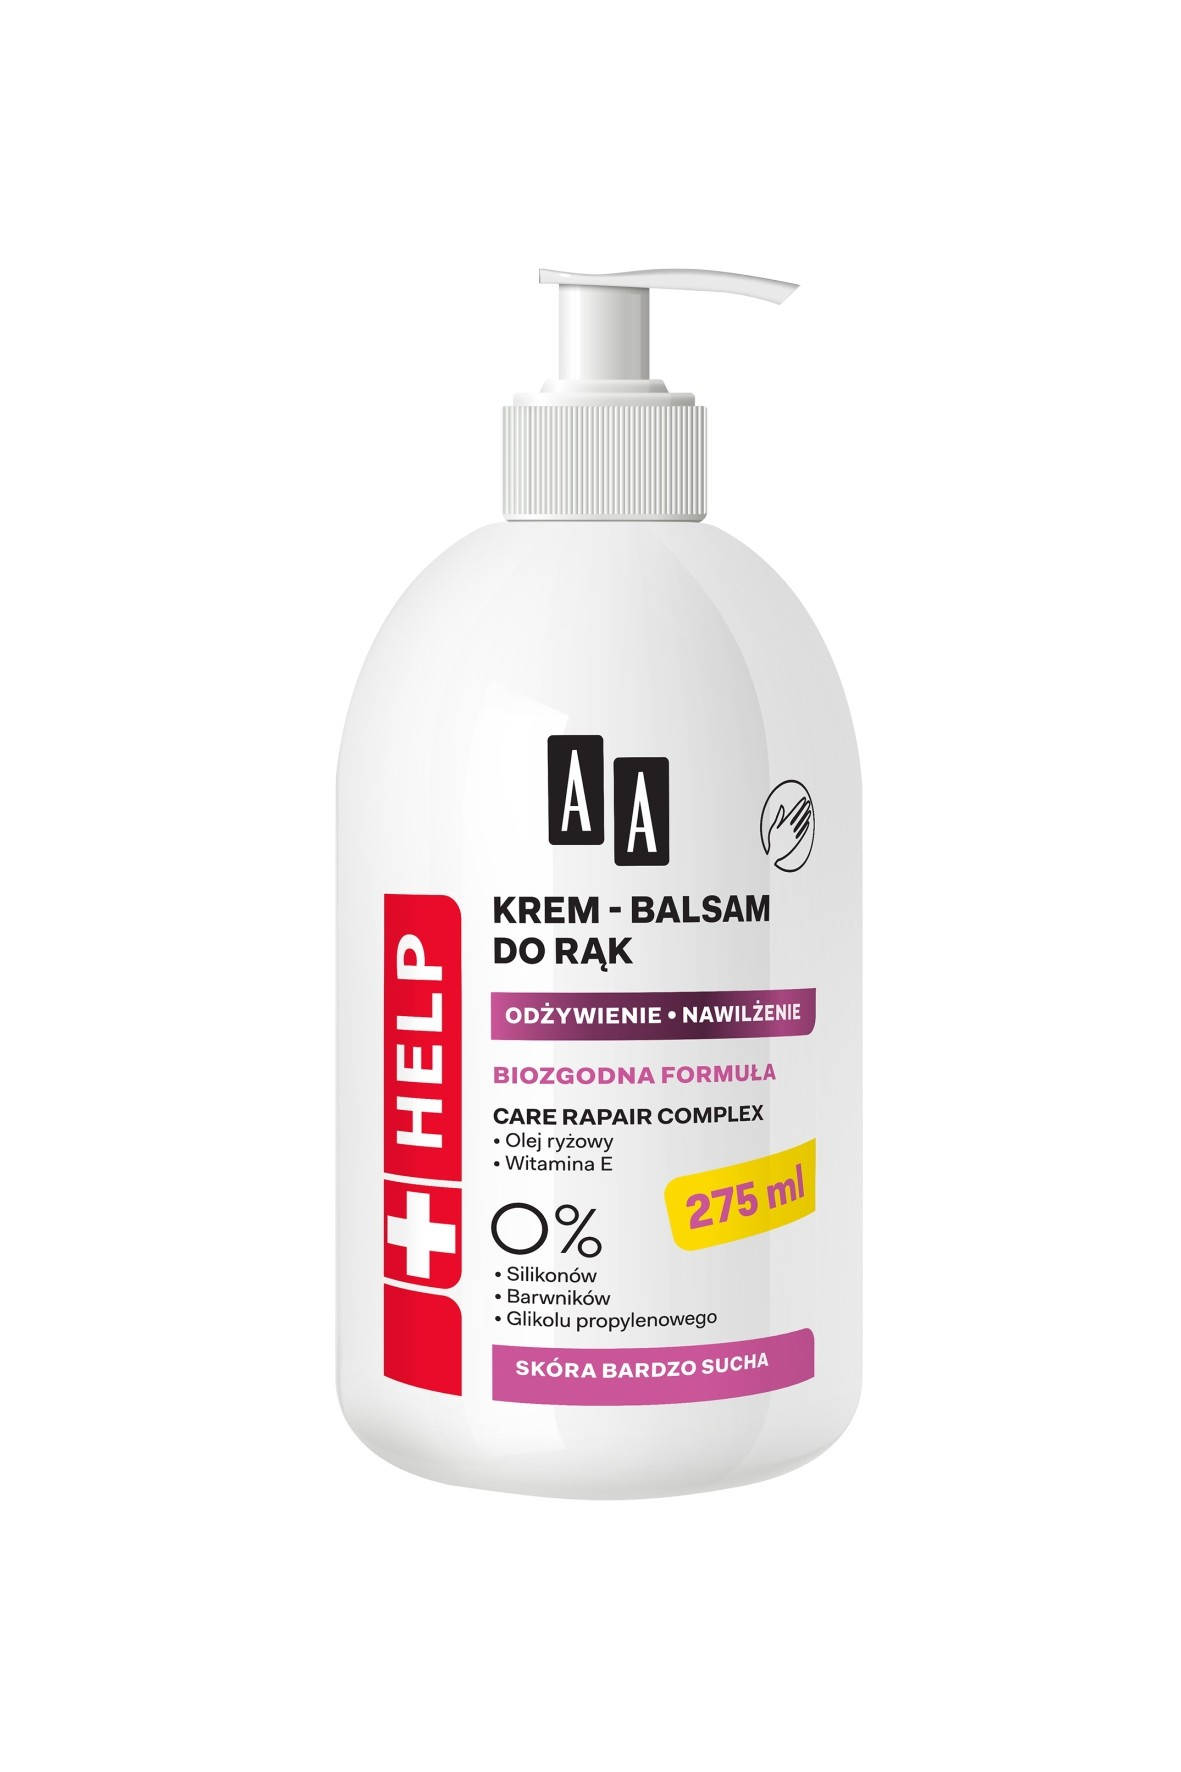 AA Help krem-balsam do rąk XXL 275 ml